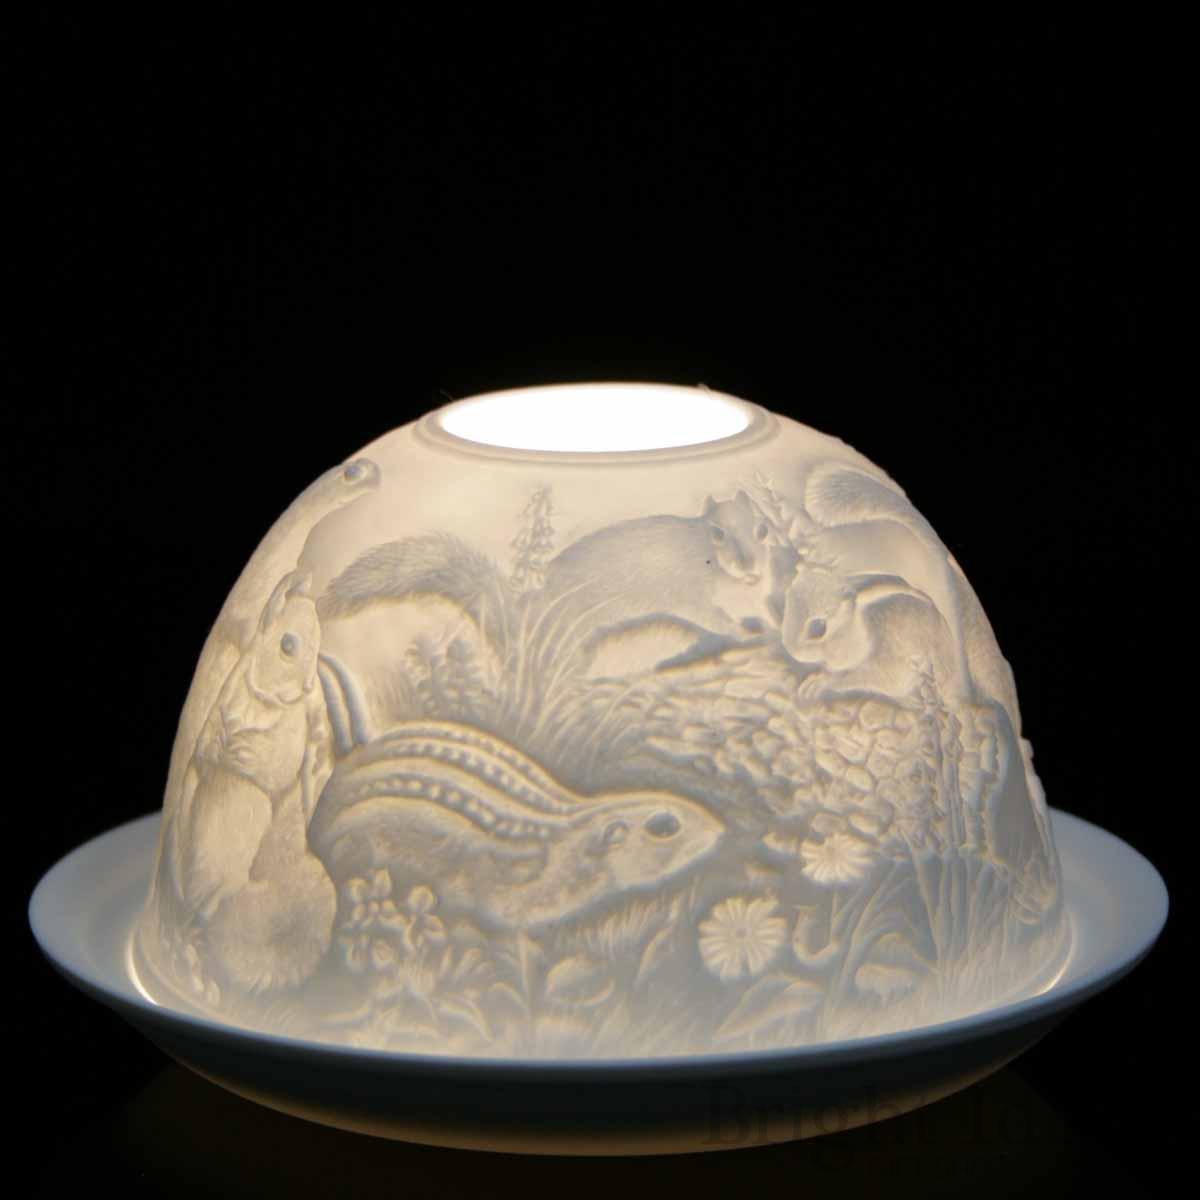 Nordic Lights White Roses Bone Porcelain Candle Shade Tea Light Holder Gift